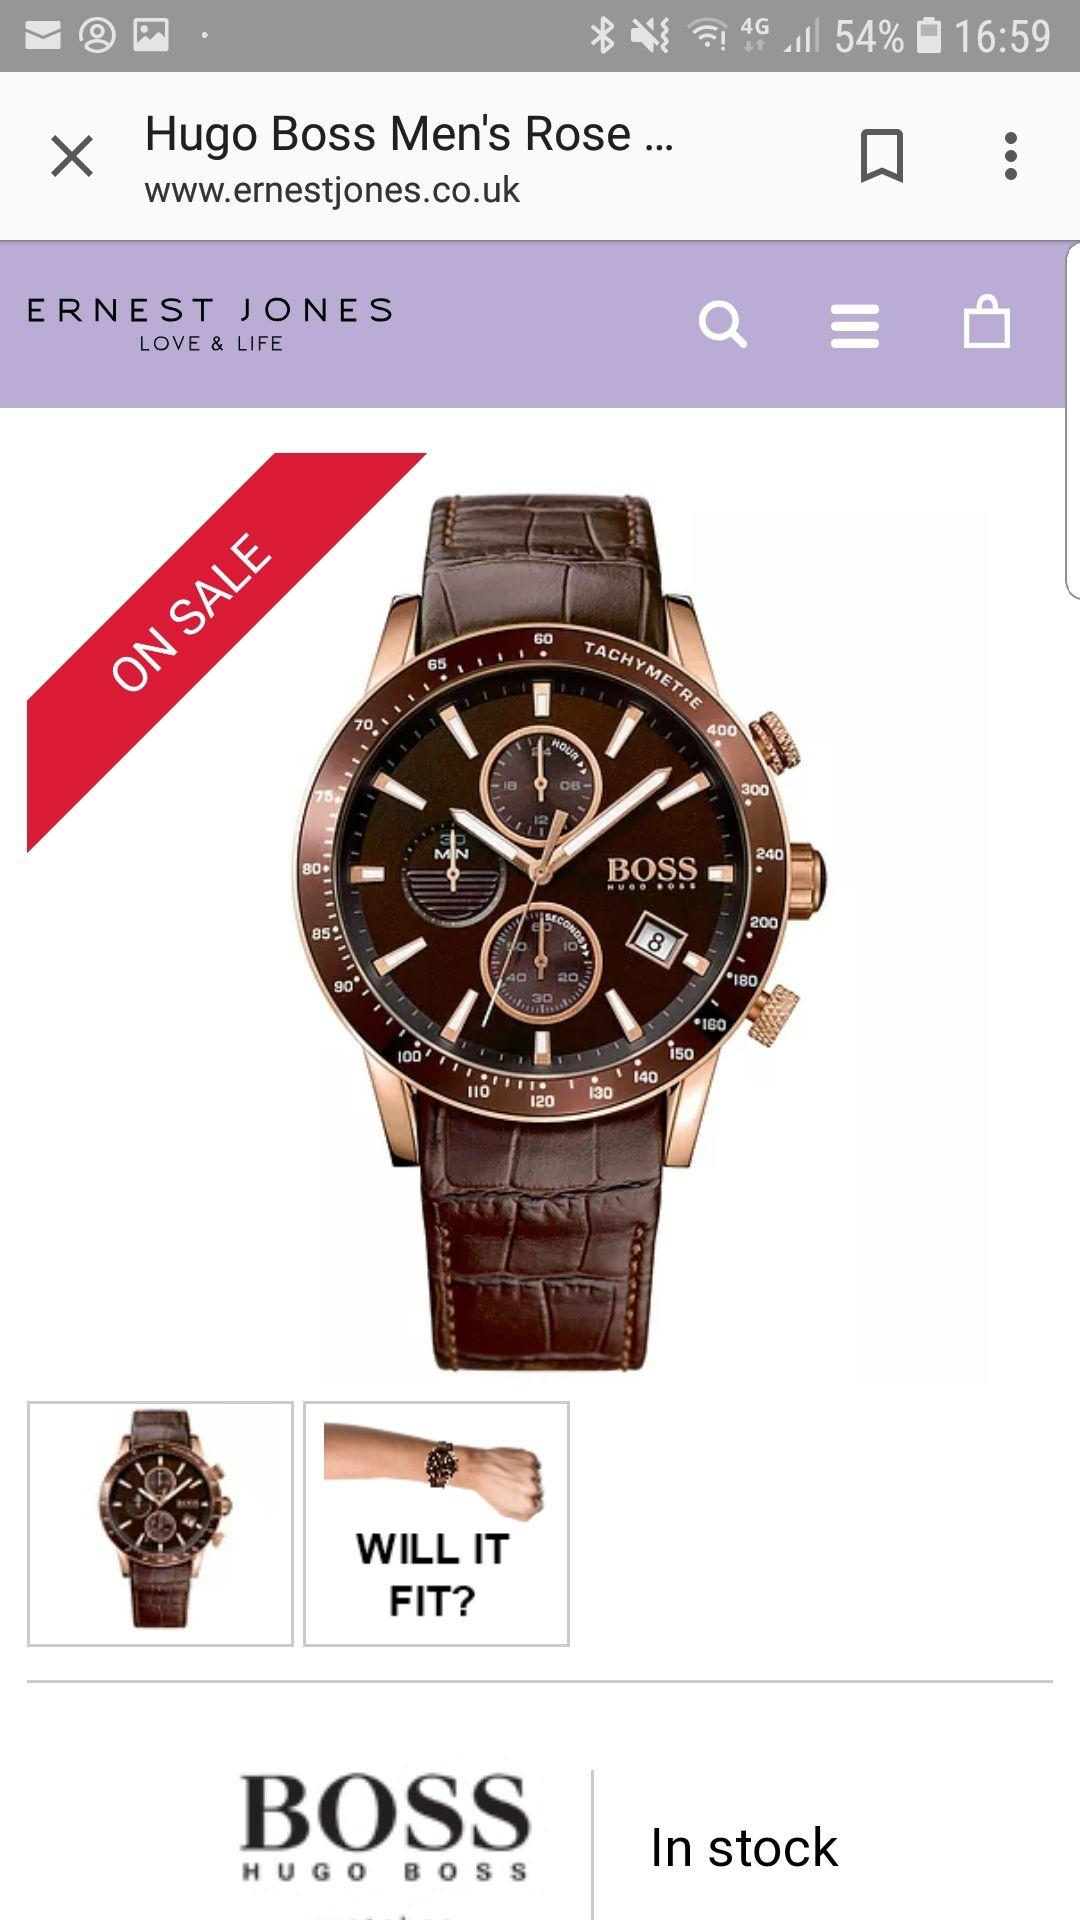 Hugo Boss Men's Rose Gold Tone Strap Watch - £134.10 with newsletter sign up @ Ernest Jones